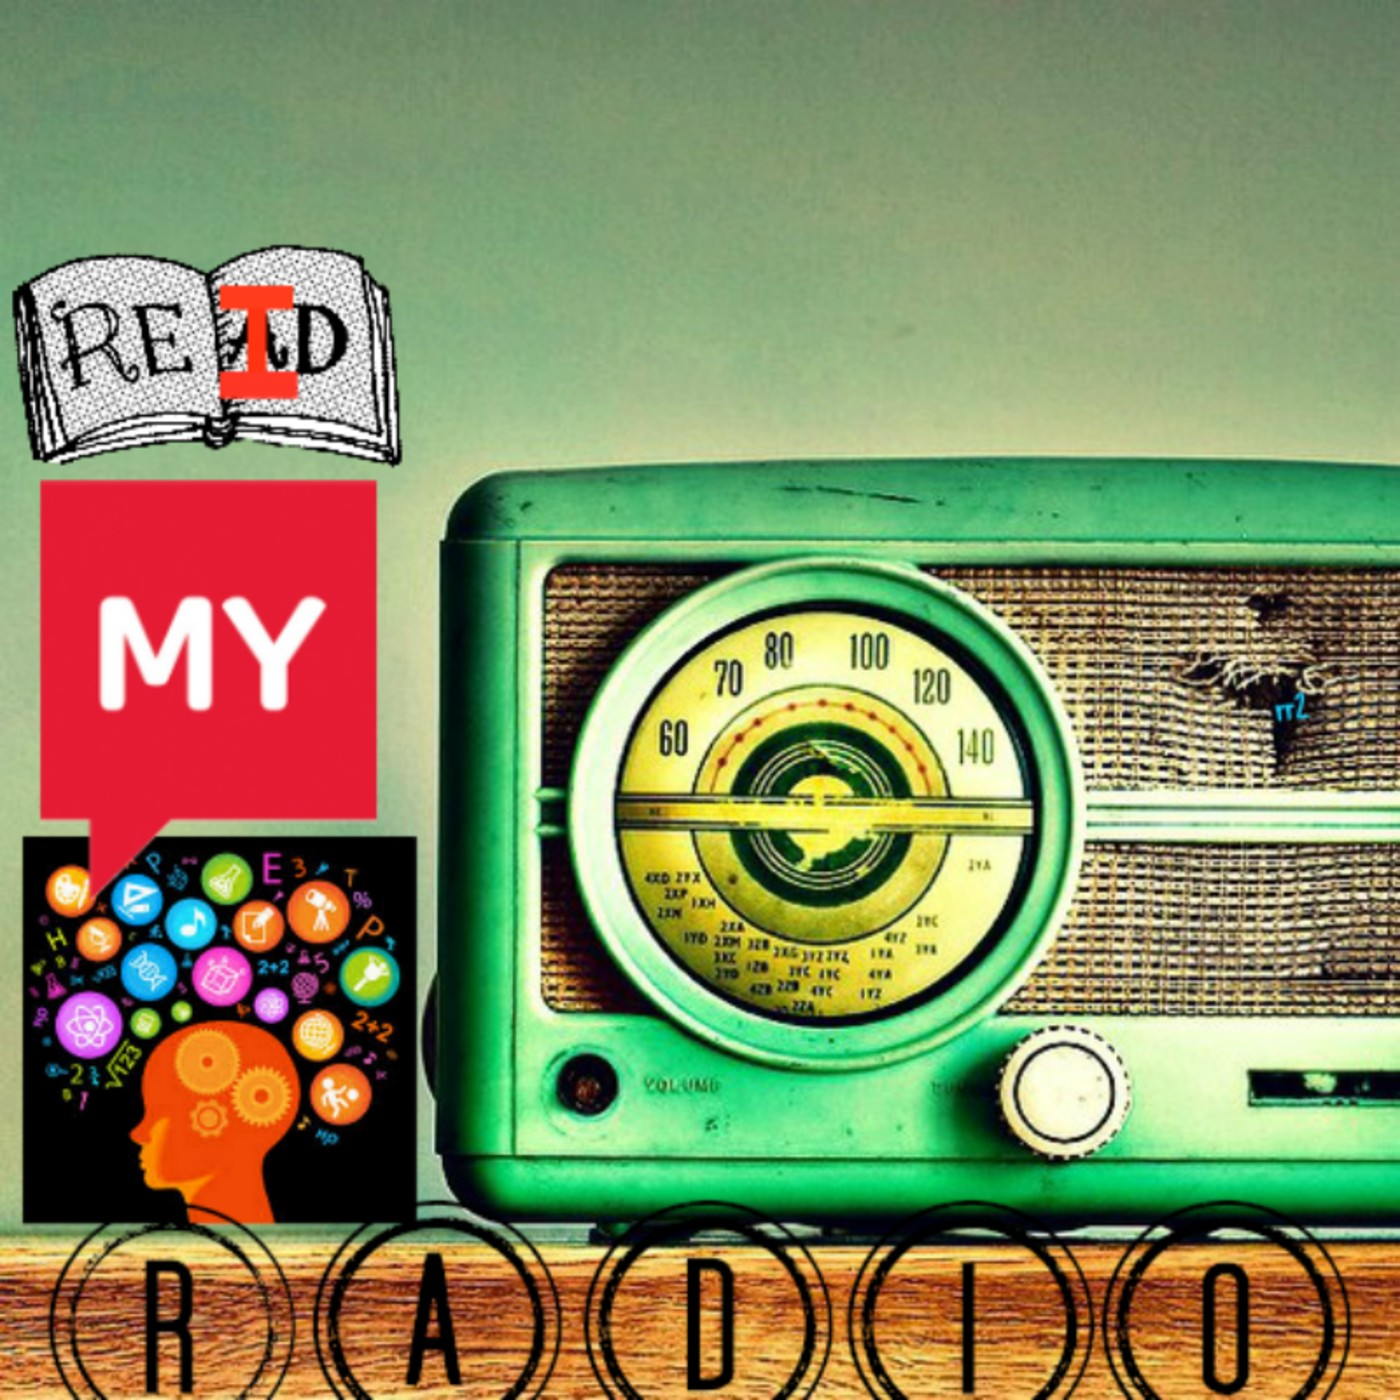 ReidMyMindRadio show art